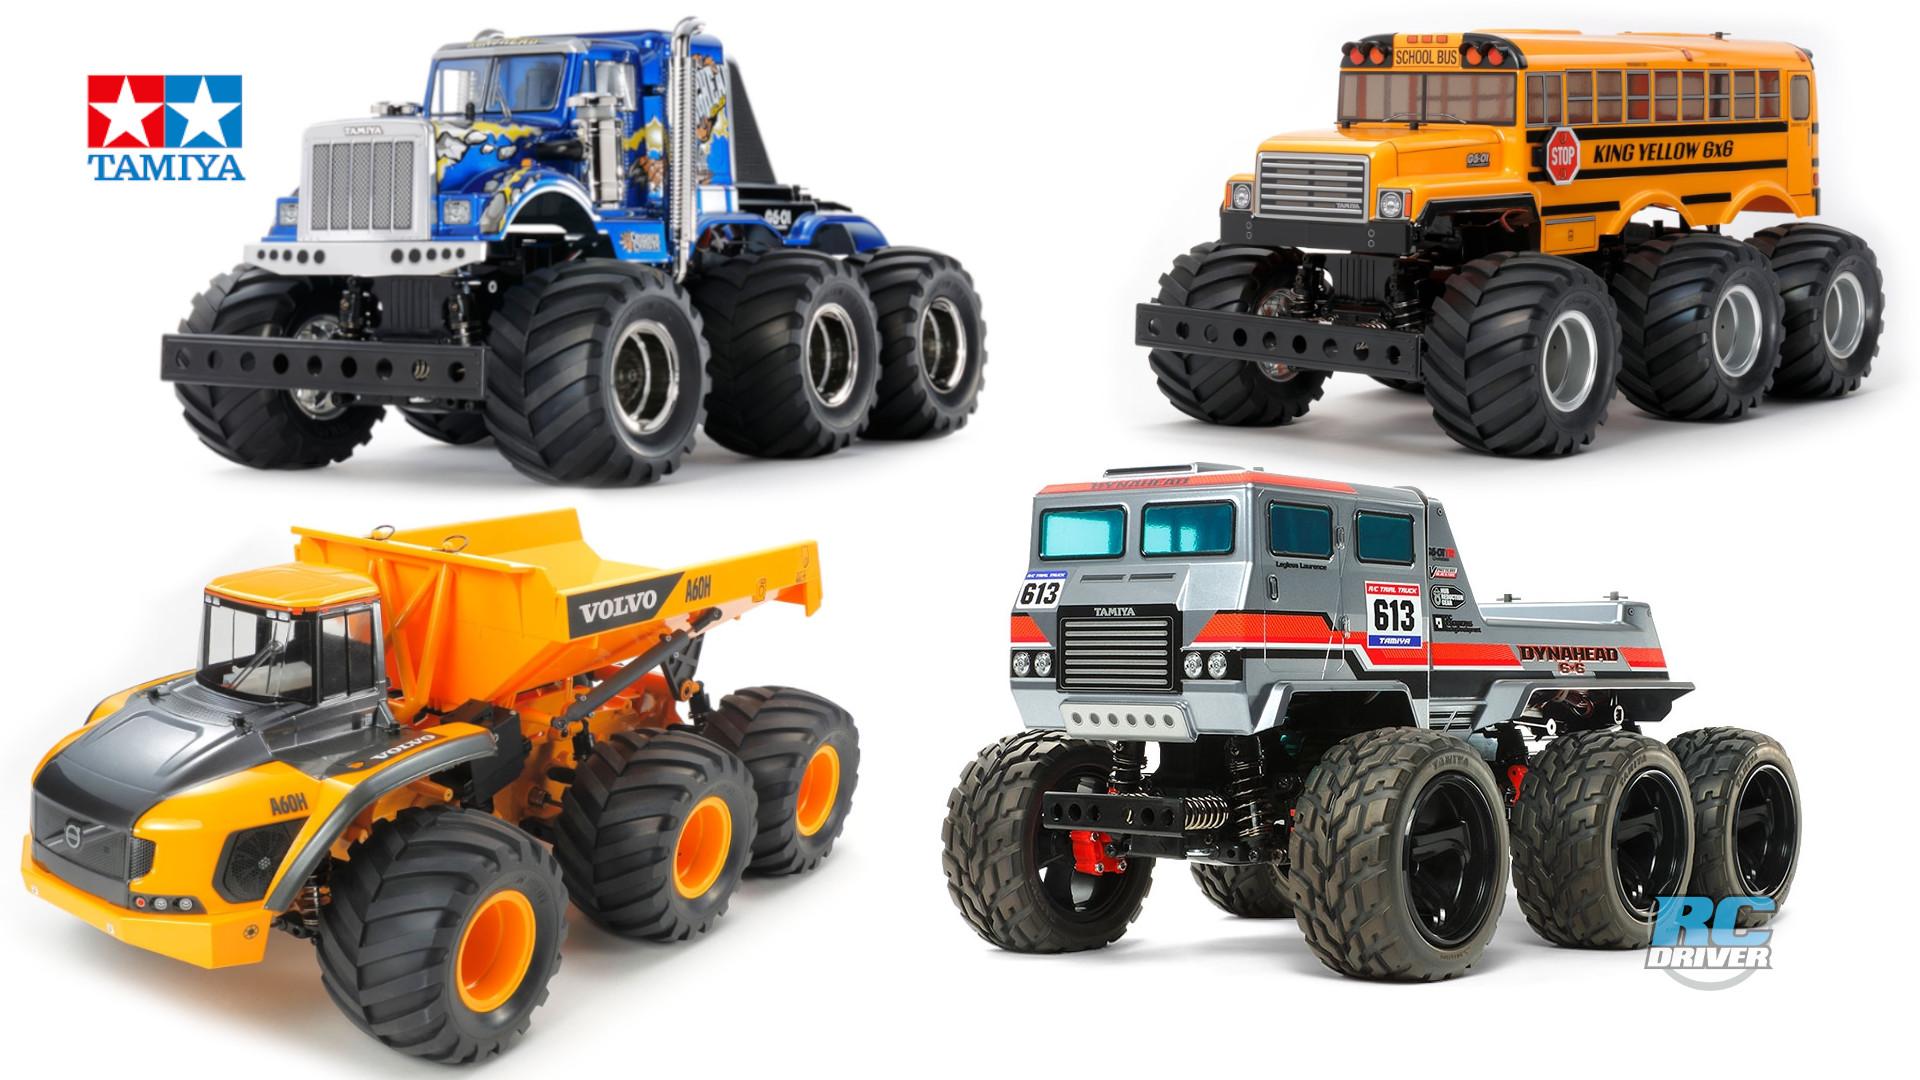 Tamiya 6x6 truck lineup